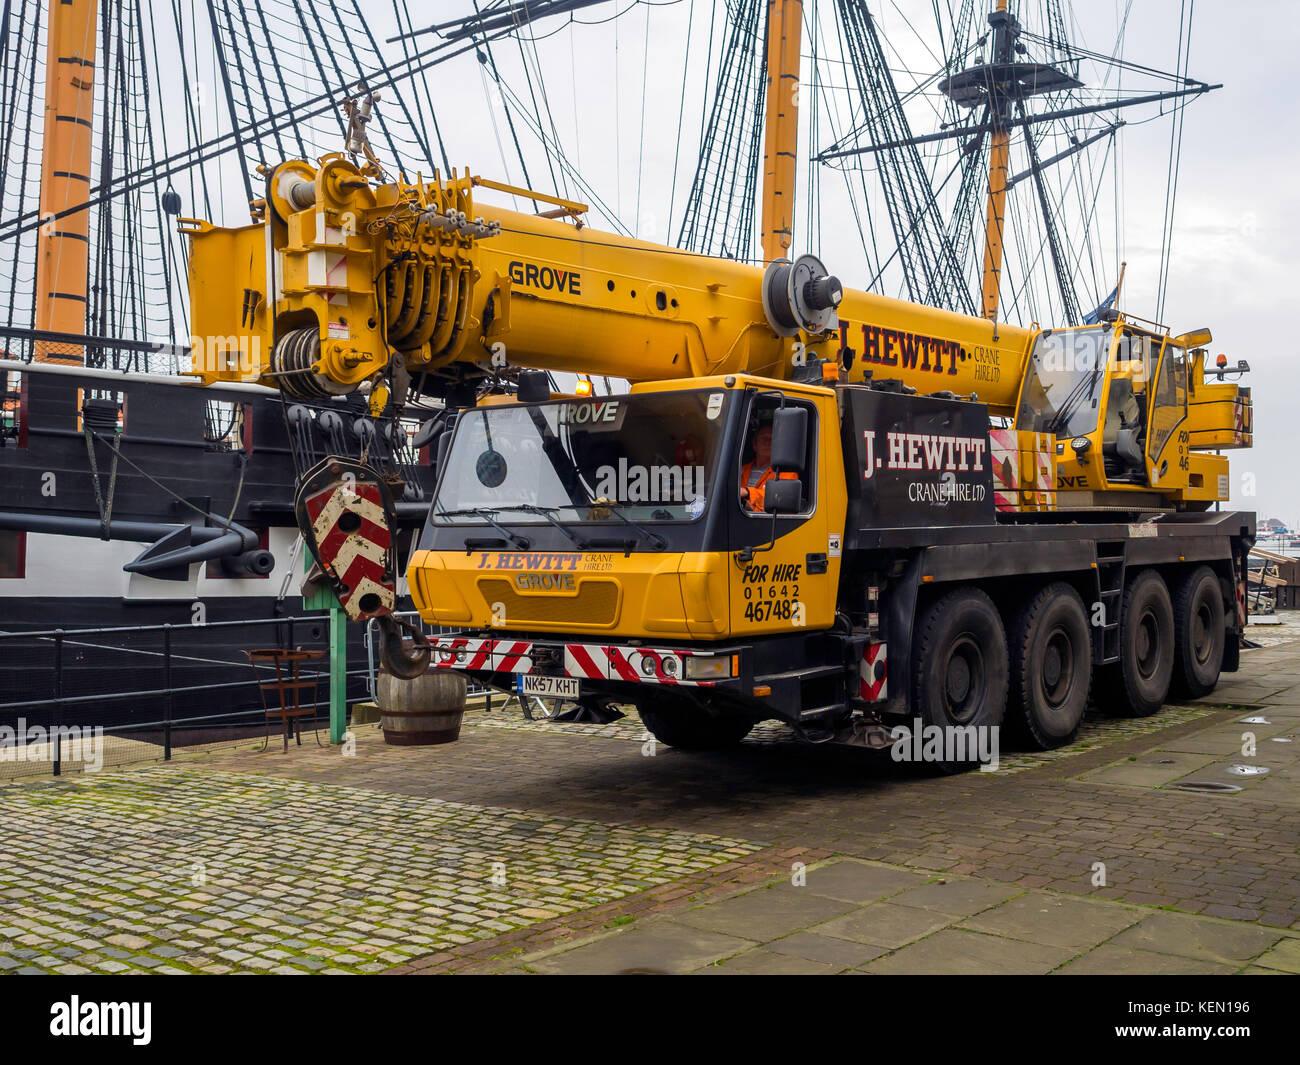 Mobile Crane Rigging : Mobile crane stock photos images alamy